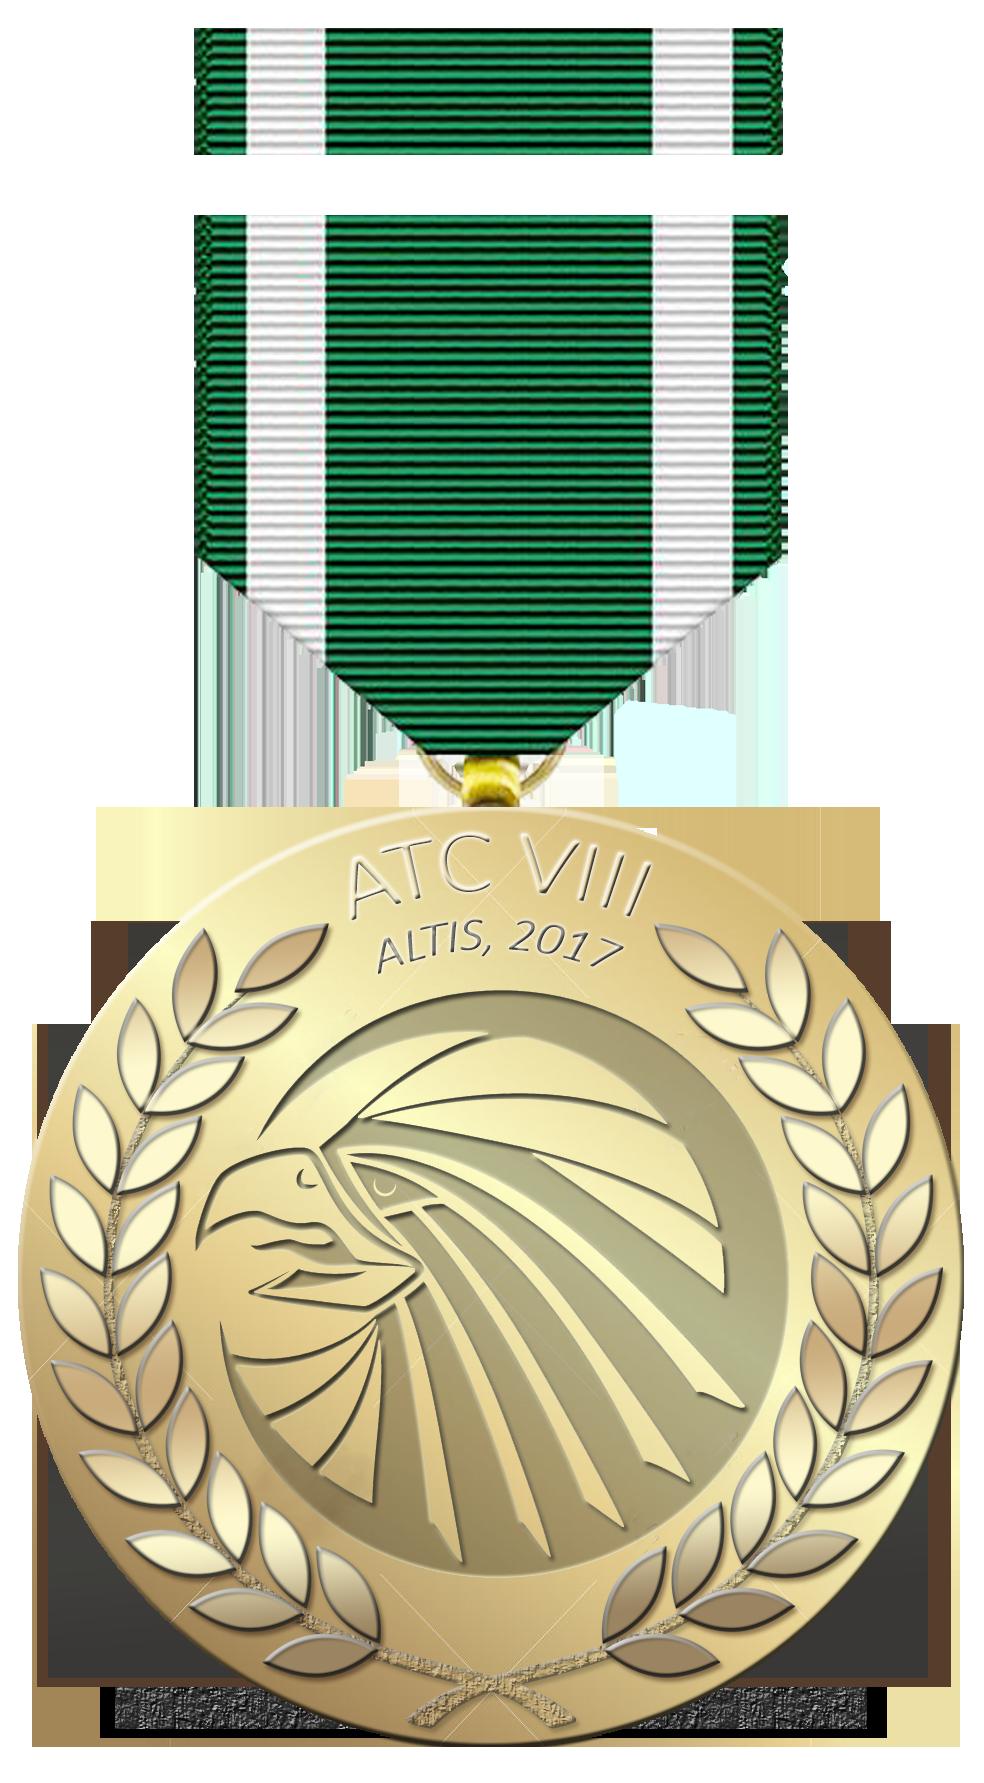 medaglia atc 8-ribbon.png